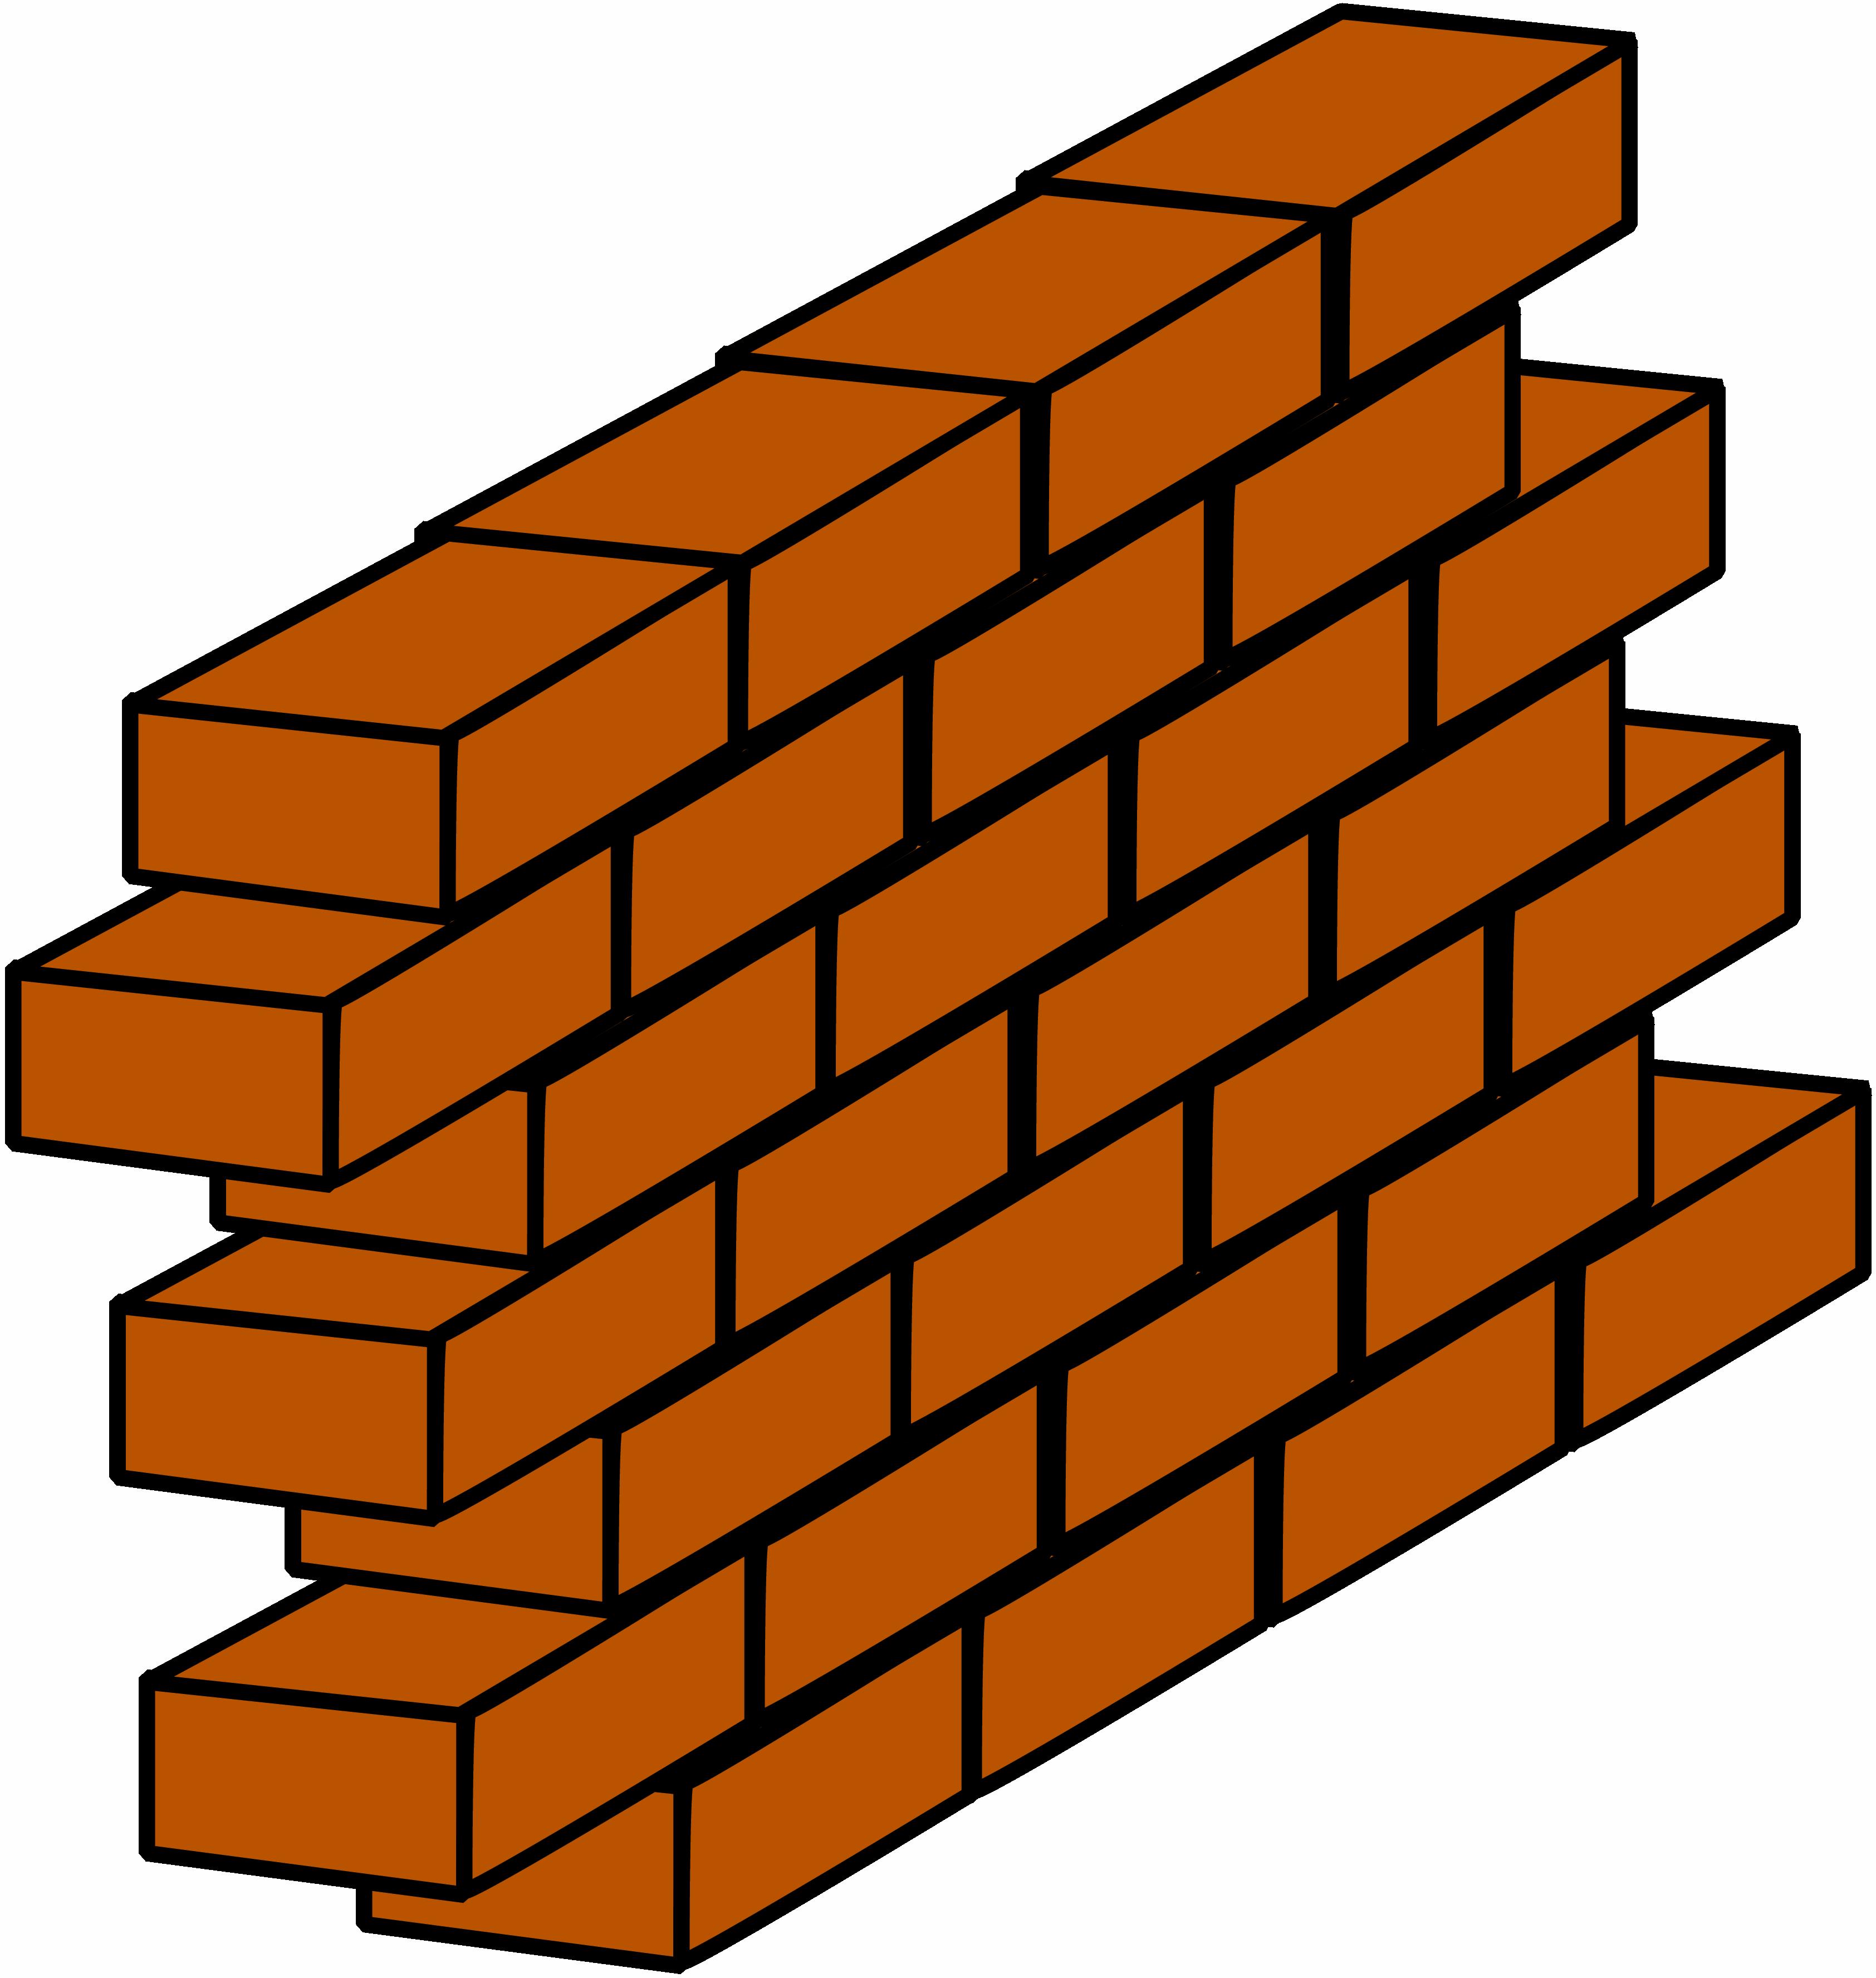 Symbol A Brick Wall Clipart Panda Free Clipart Images